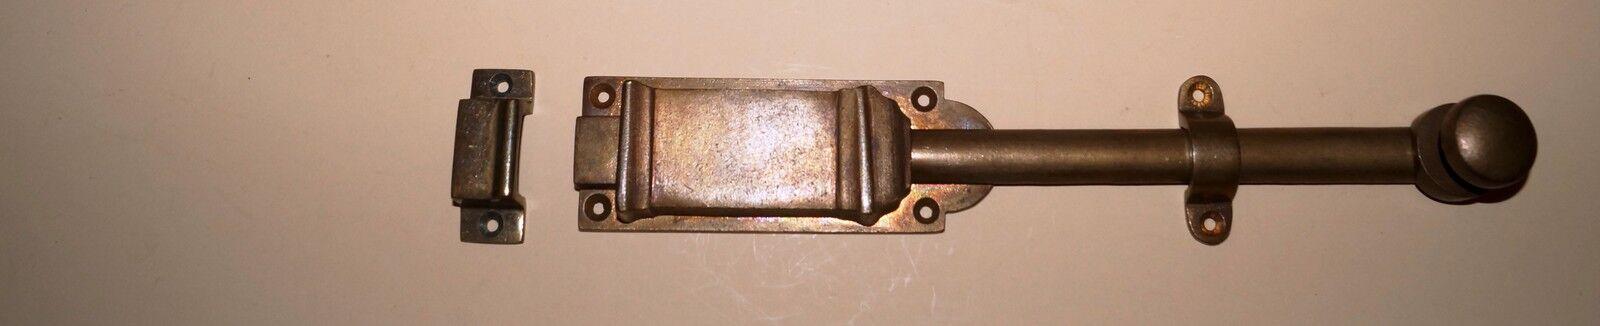 Riegel ab 26 cm bis Länge Länge Länge ca. 42 cm, Oberfläche Messing-Antik   Billig  2850dc